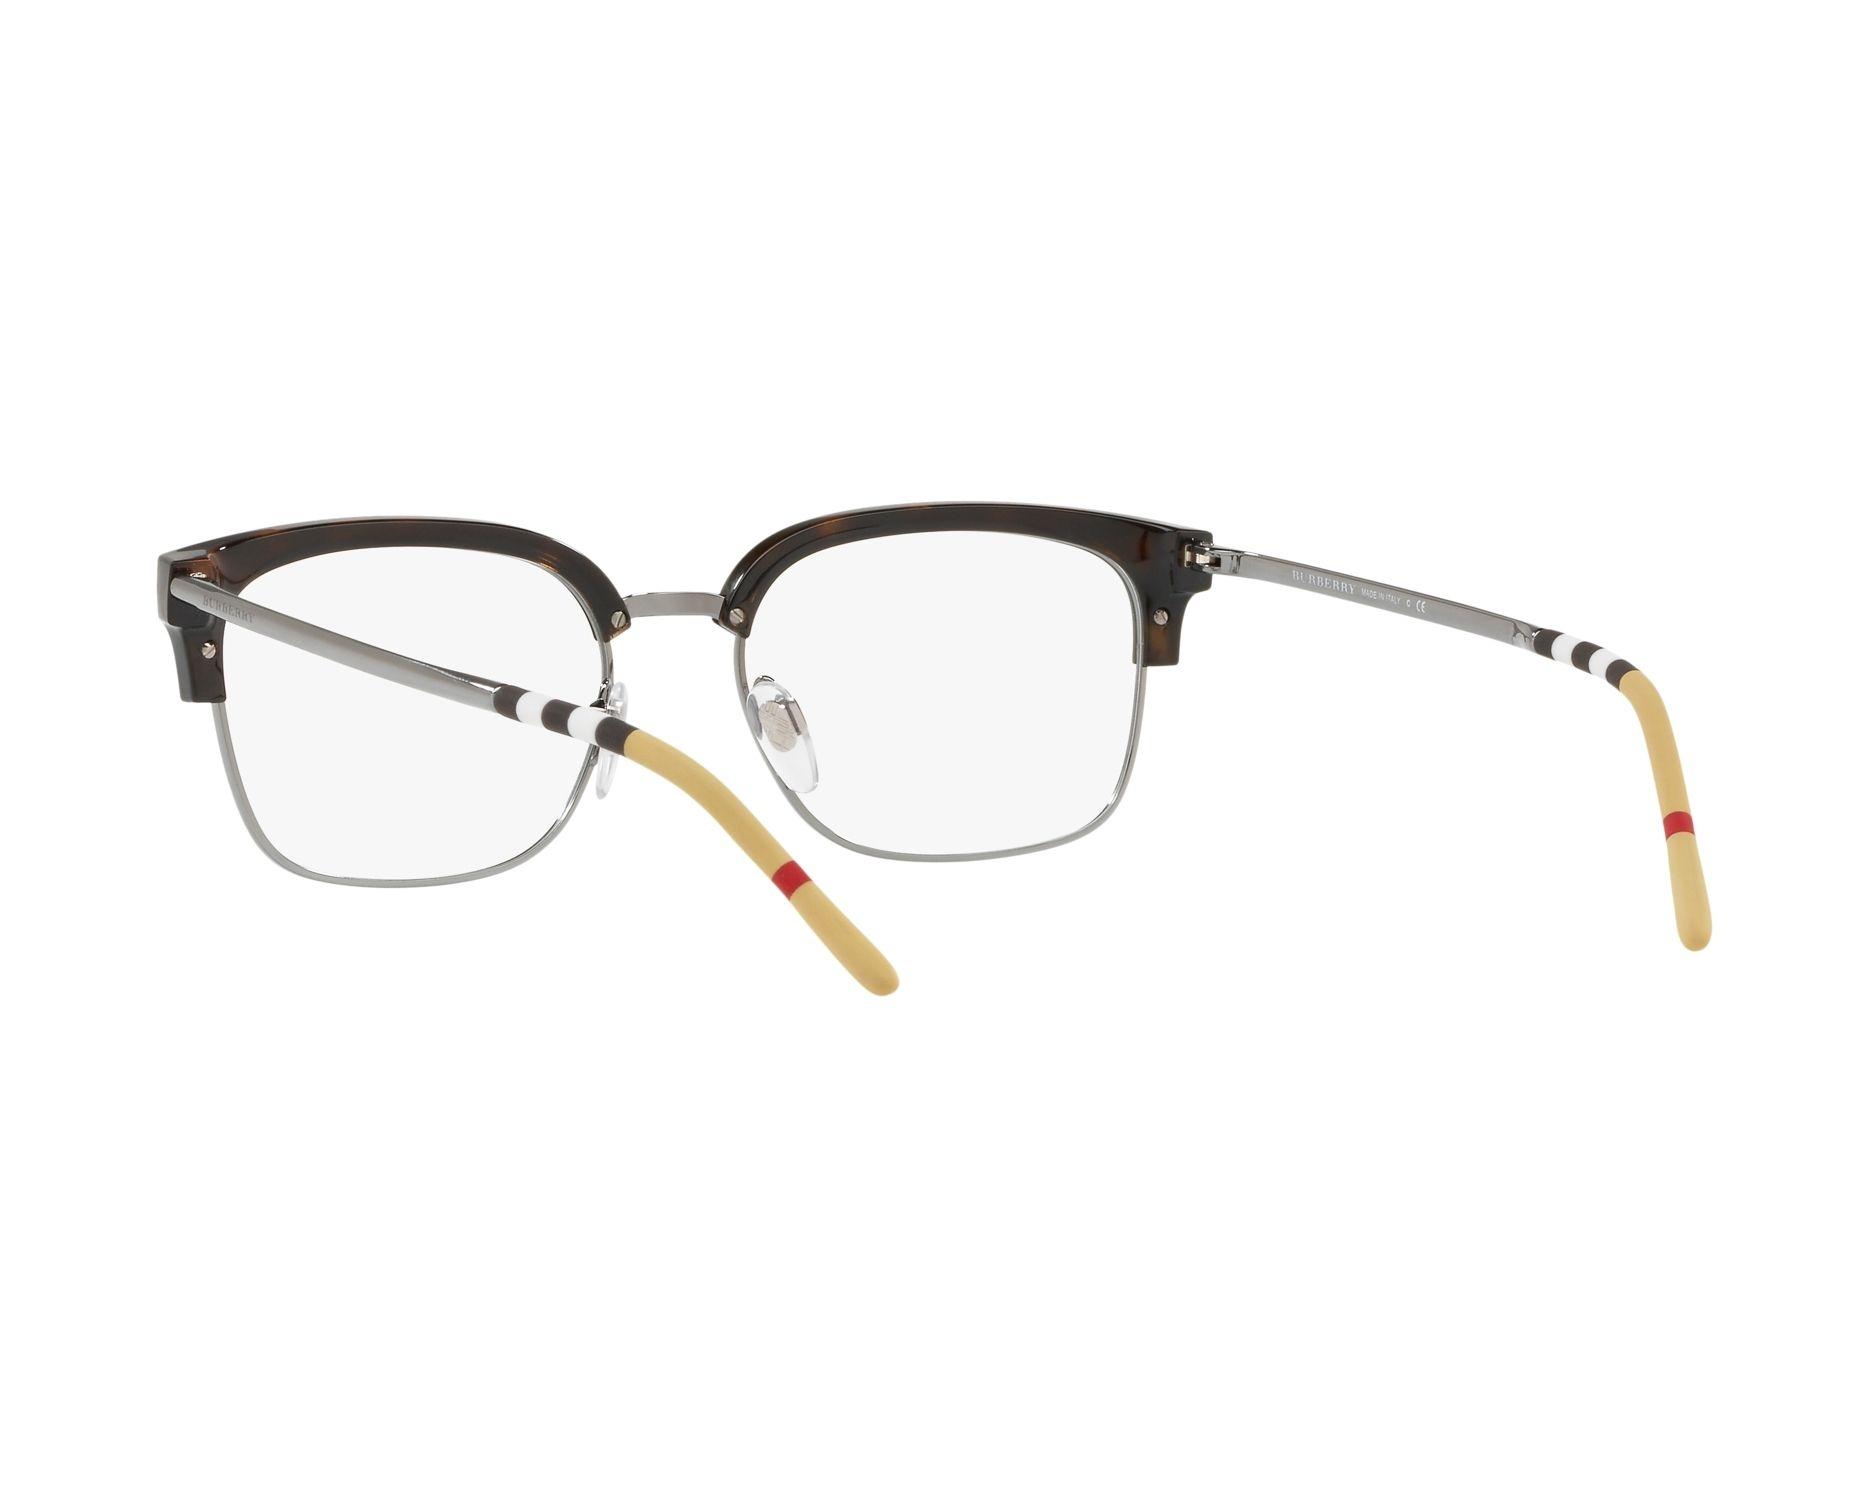 eyeglasses Burberry BE-2273 3002 54-18 Havana Gun 360 degree view 6